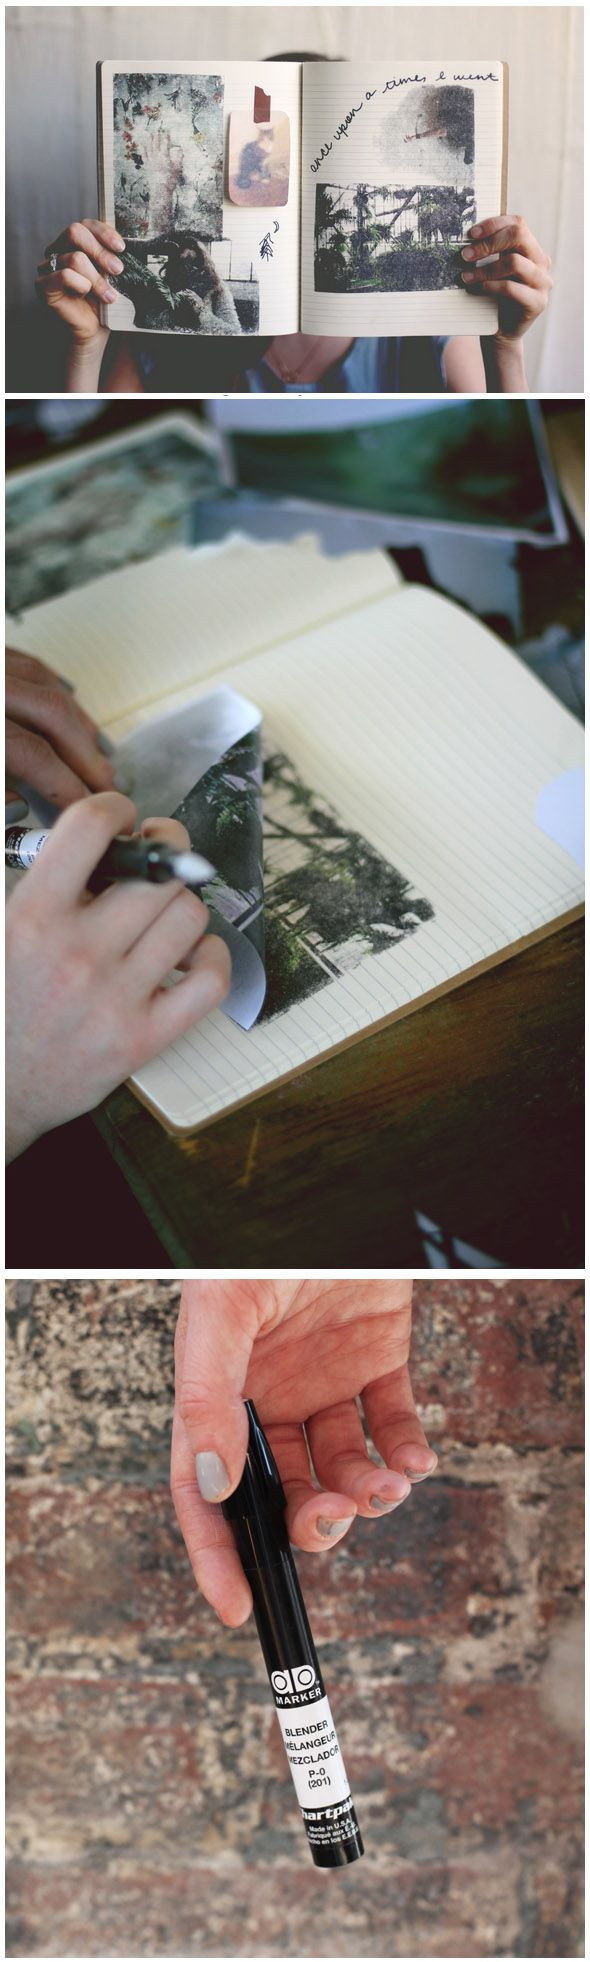 Transfert Photocopie Sur Bois instant photo transfers with blender pens | diy photo, craft